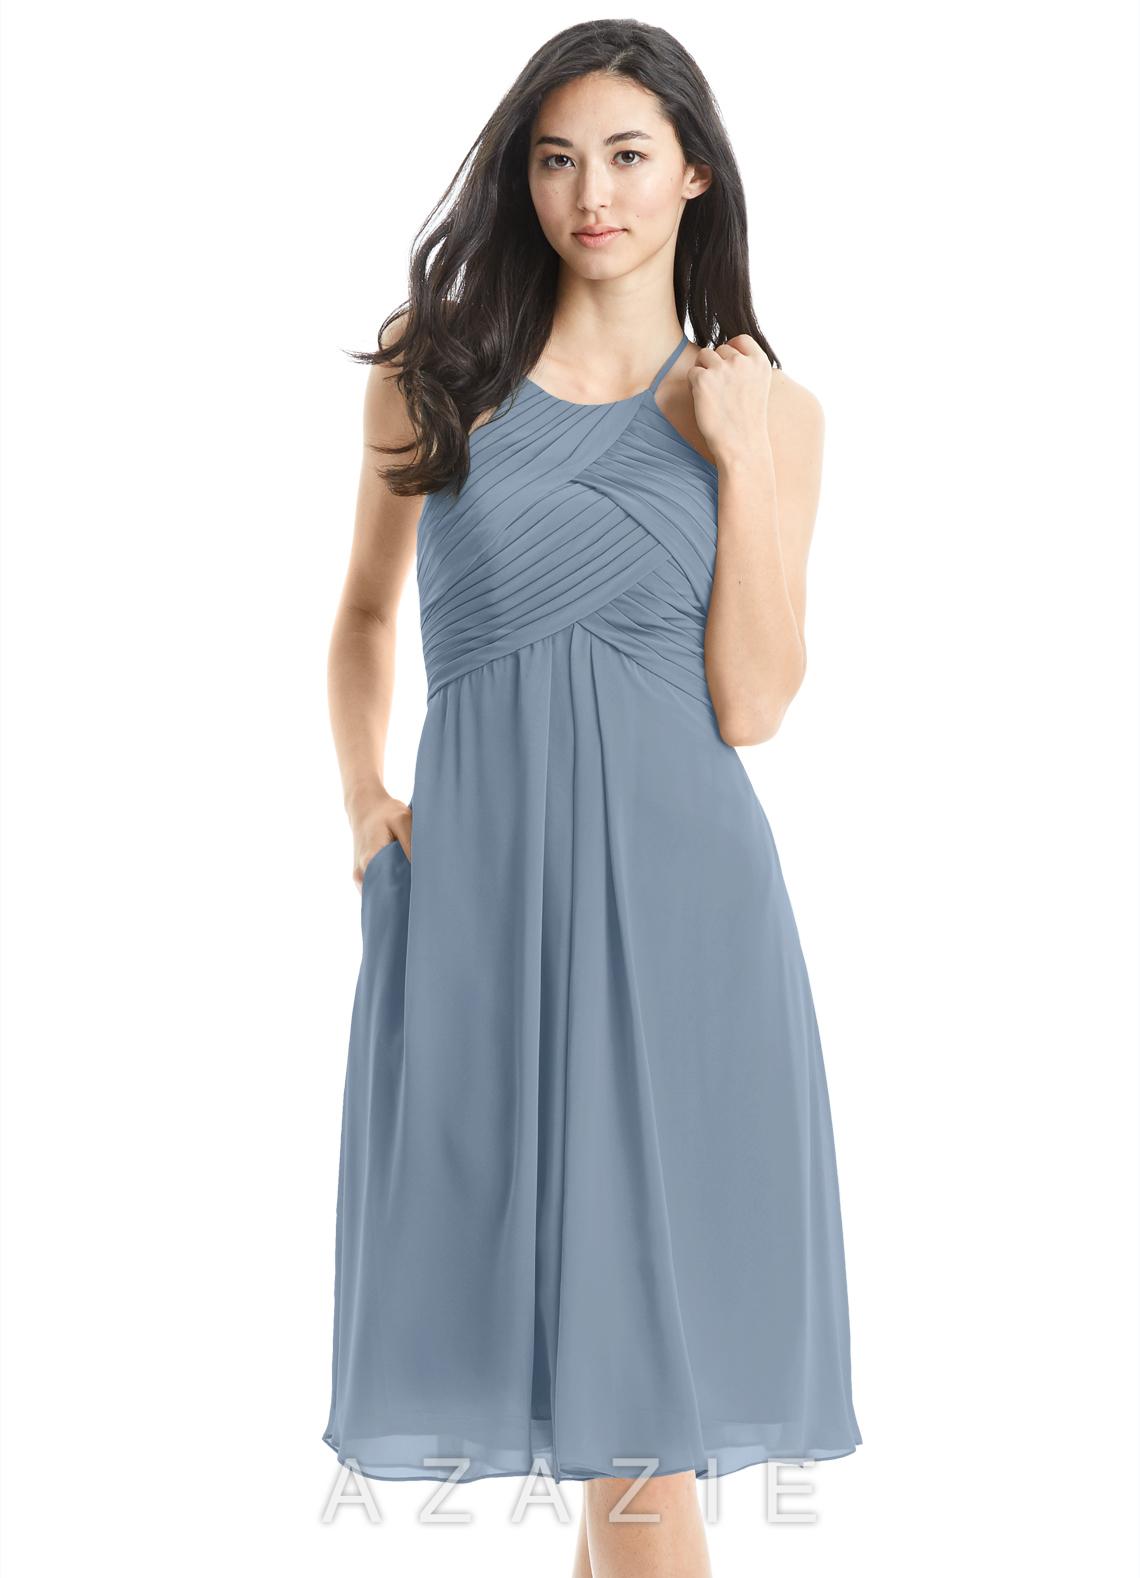 78a958276a Azazie Adriana Bridesmaid Dress - Dusty Blue